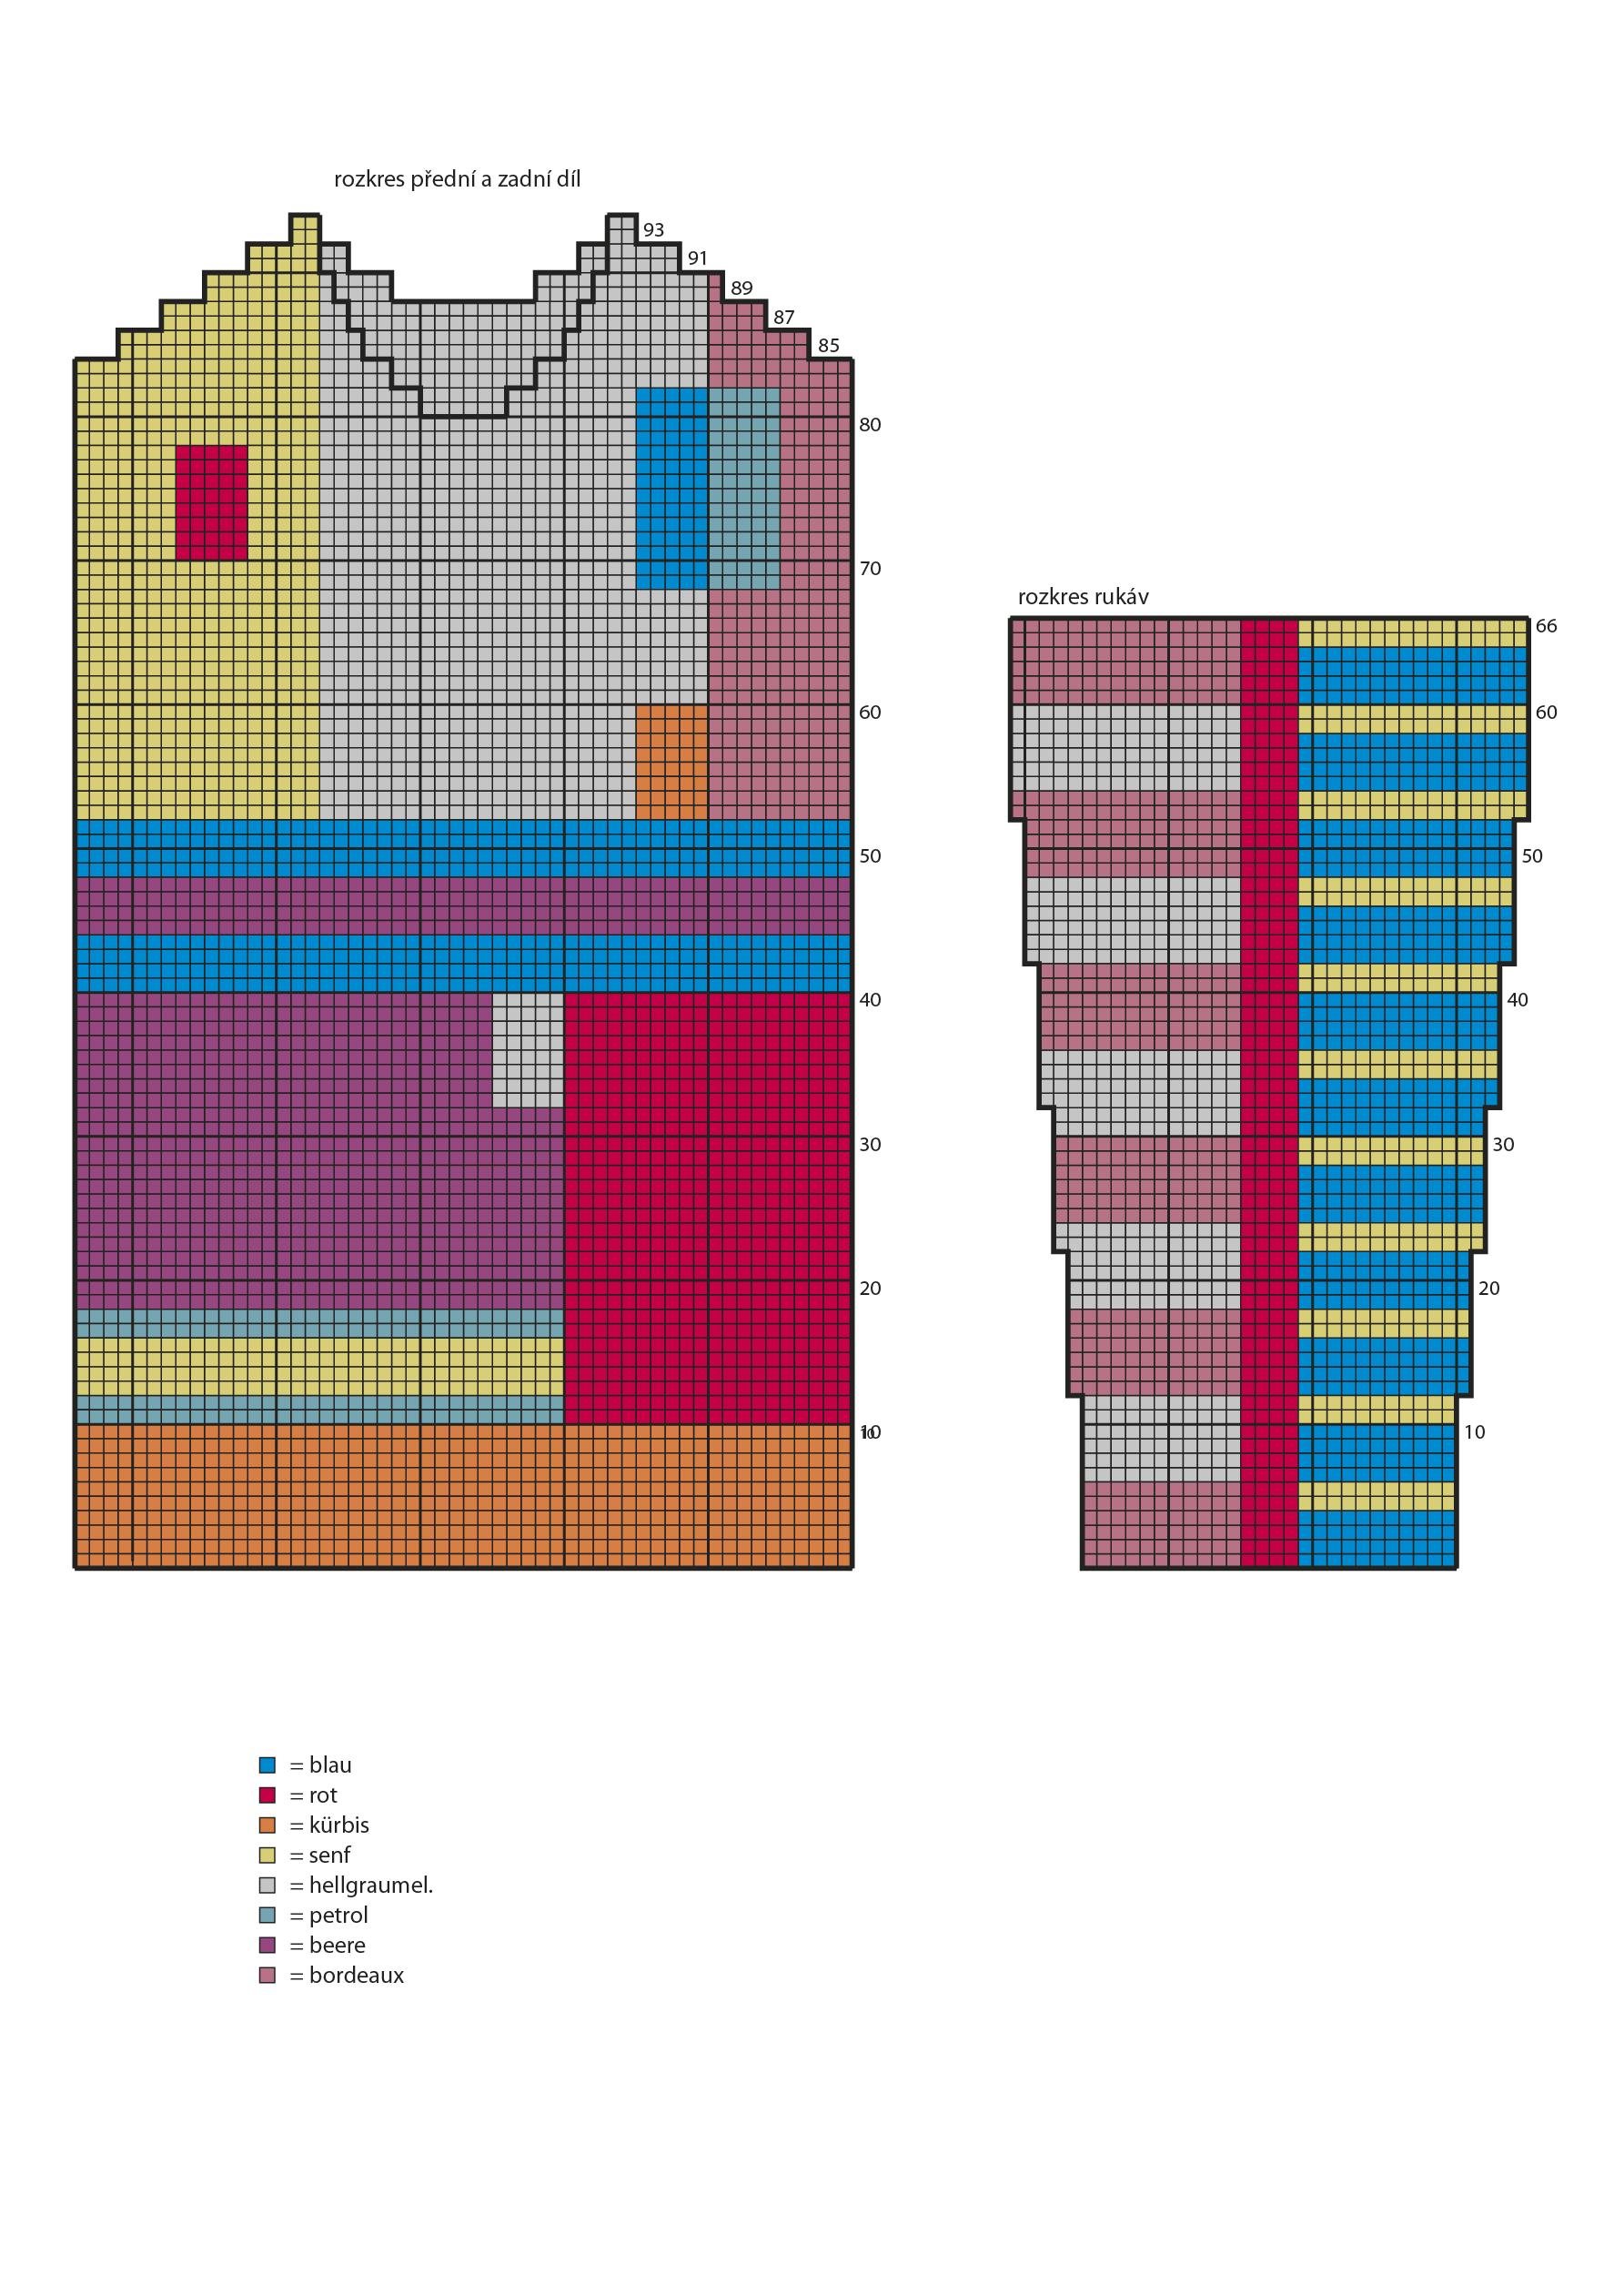 2018-Z-18 rozkres dámského pleteného svetru